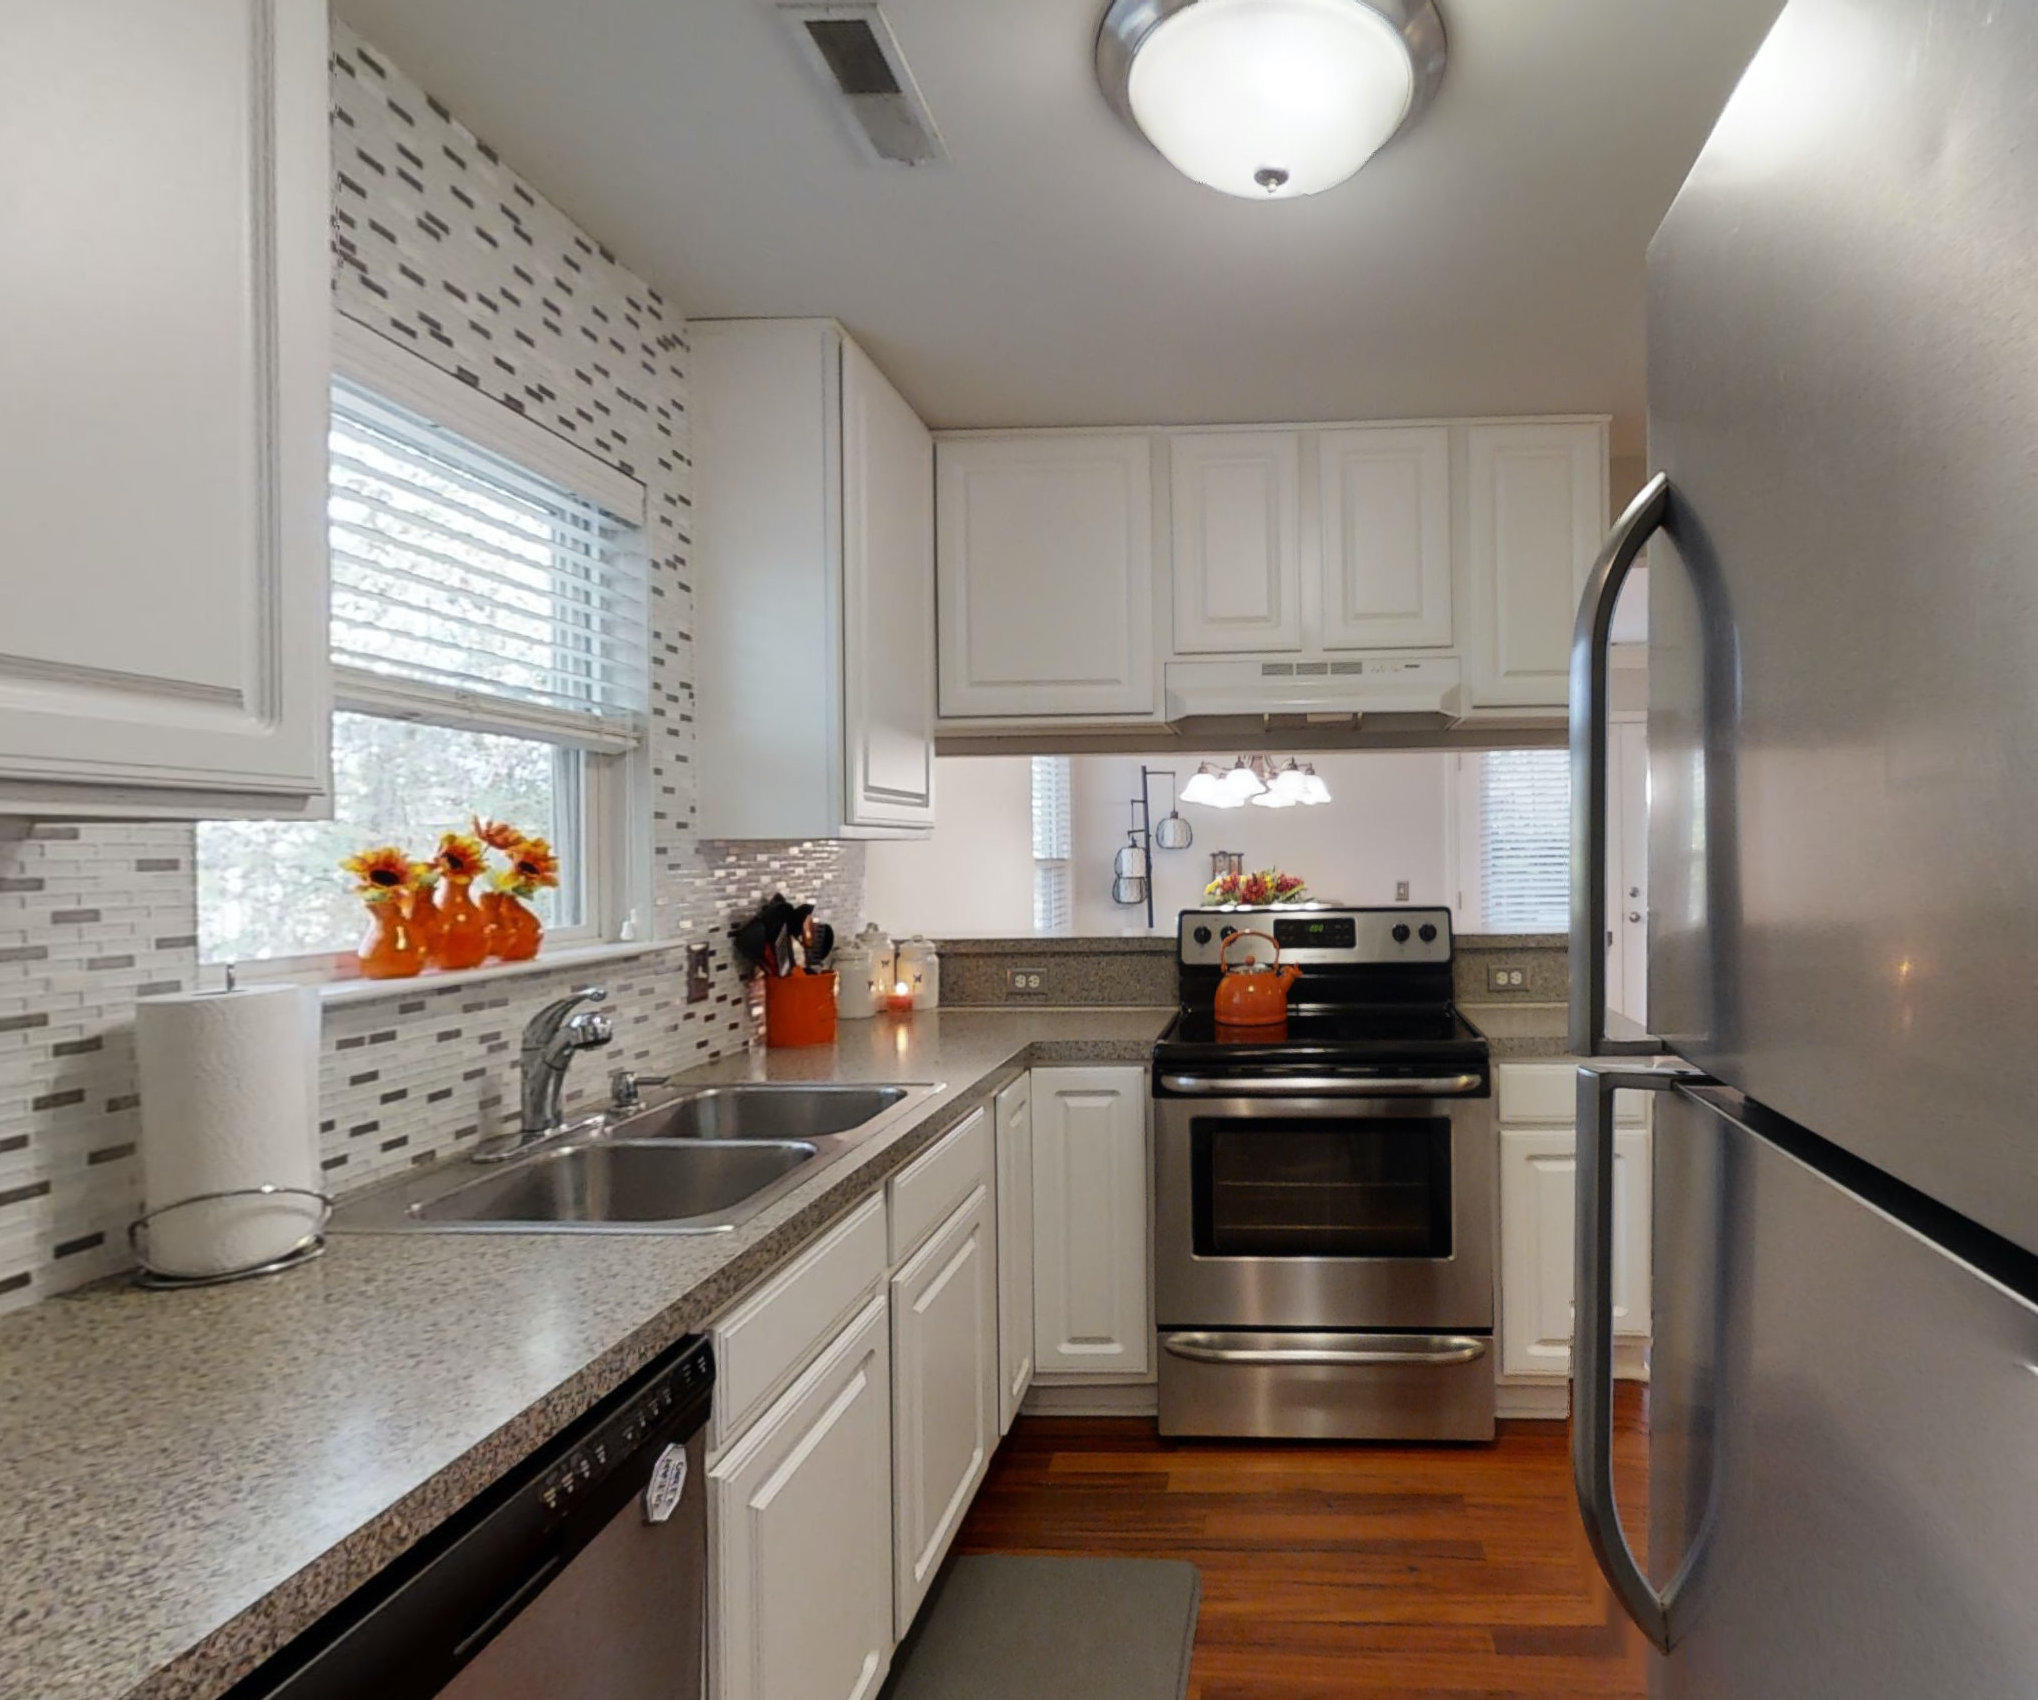 Longbranch Point Homes For Sale - 940 Estates, Charleston, SC - 9